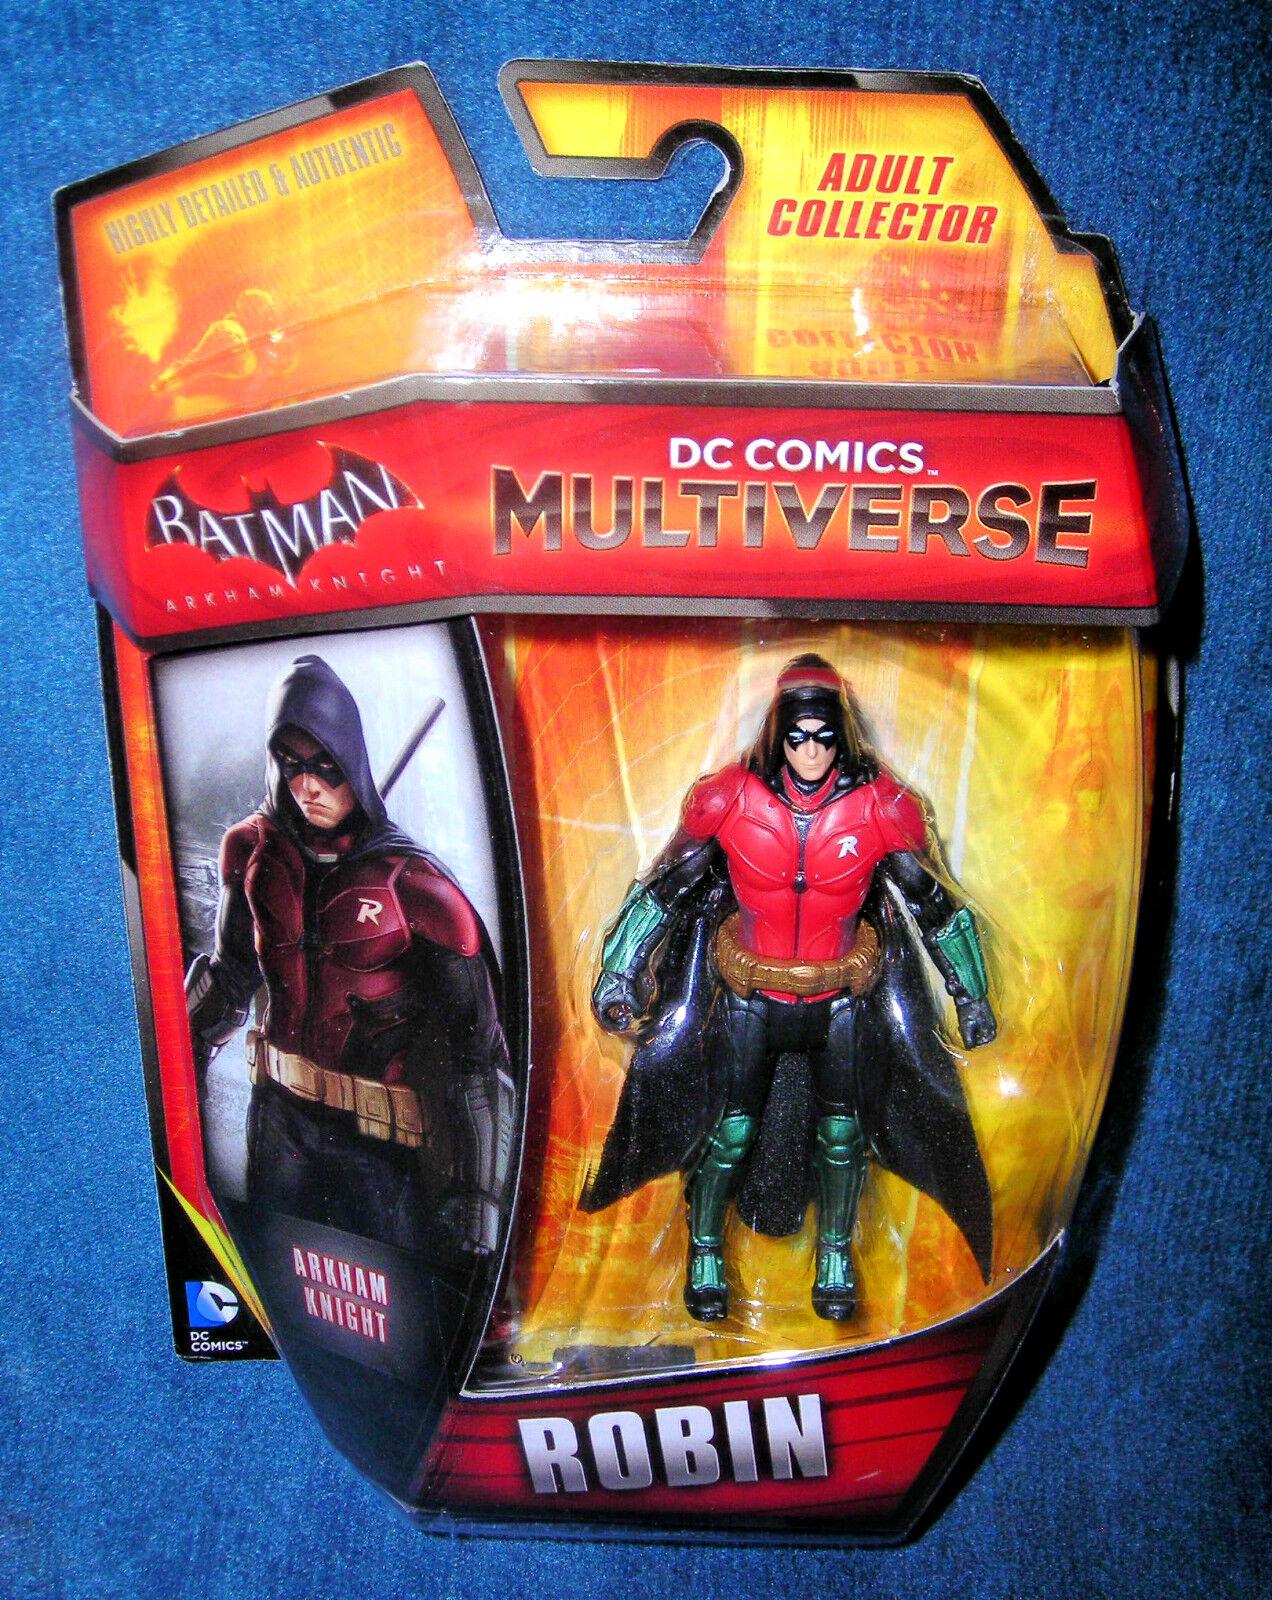 BATMAN DC MULTIVERSE ROBIN TIM DRAKE UNIVERSE GOTHAM ARKHAM LEGENDS HOT